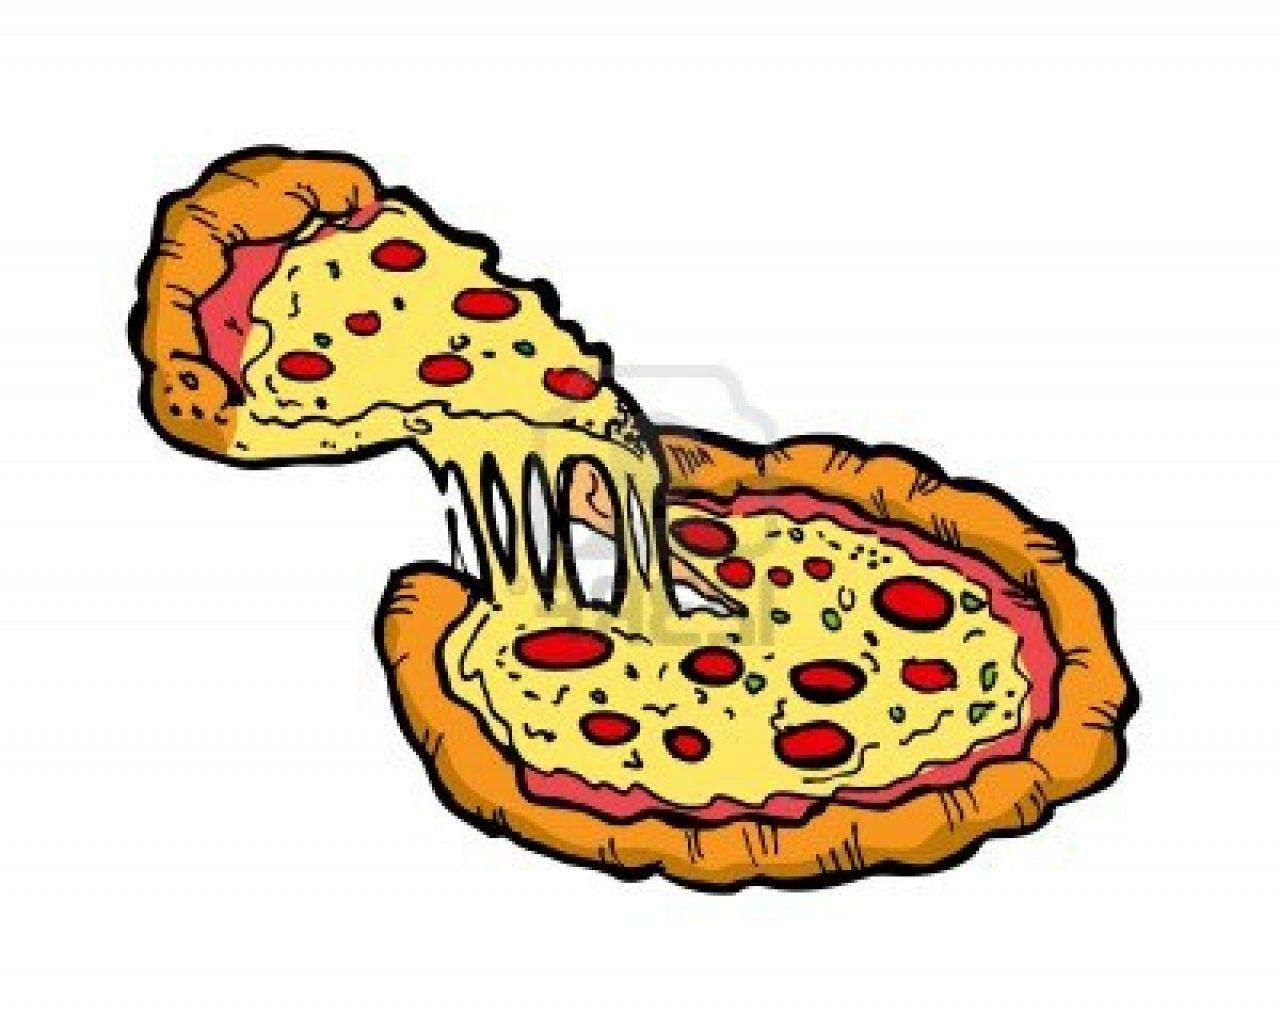 1280x1014 Pizza Clipart Free